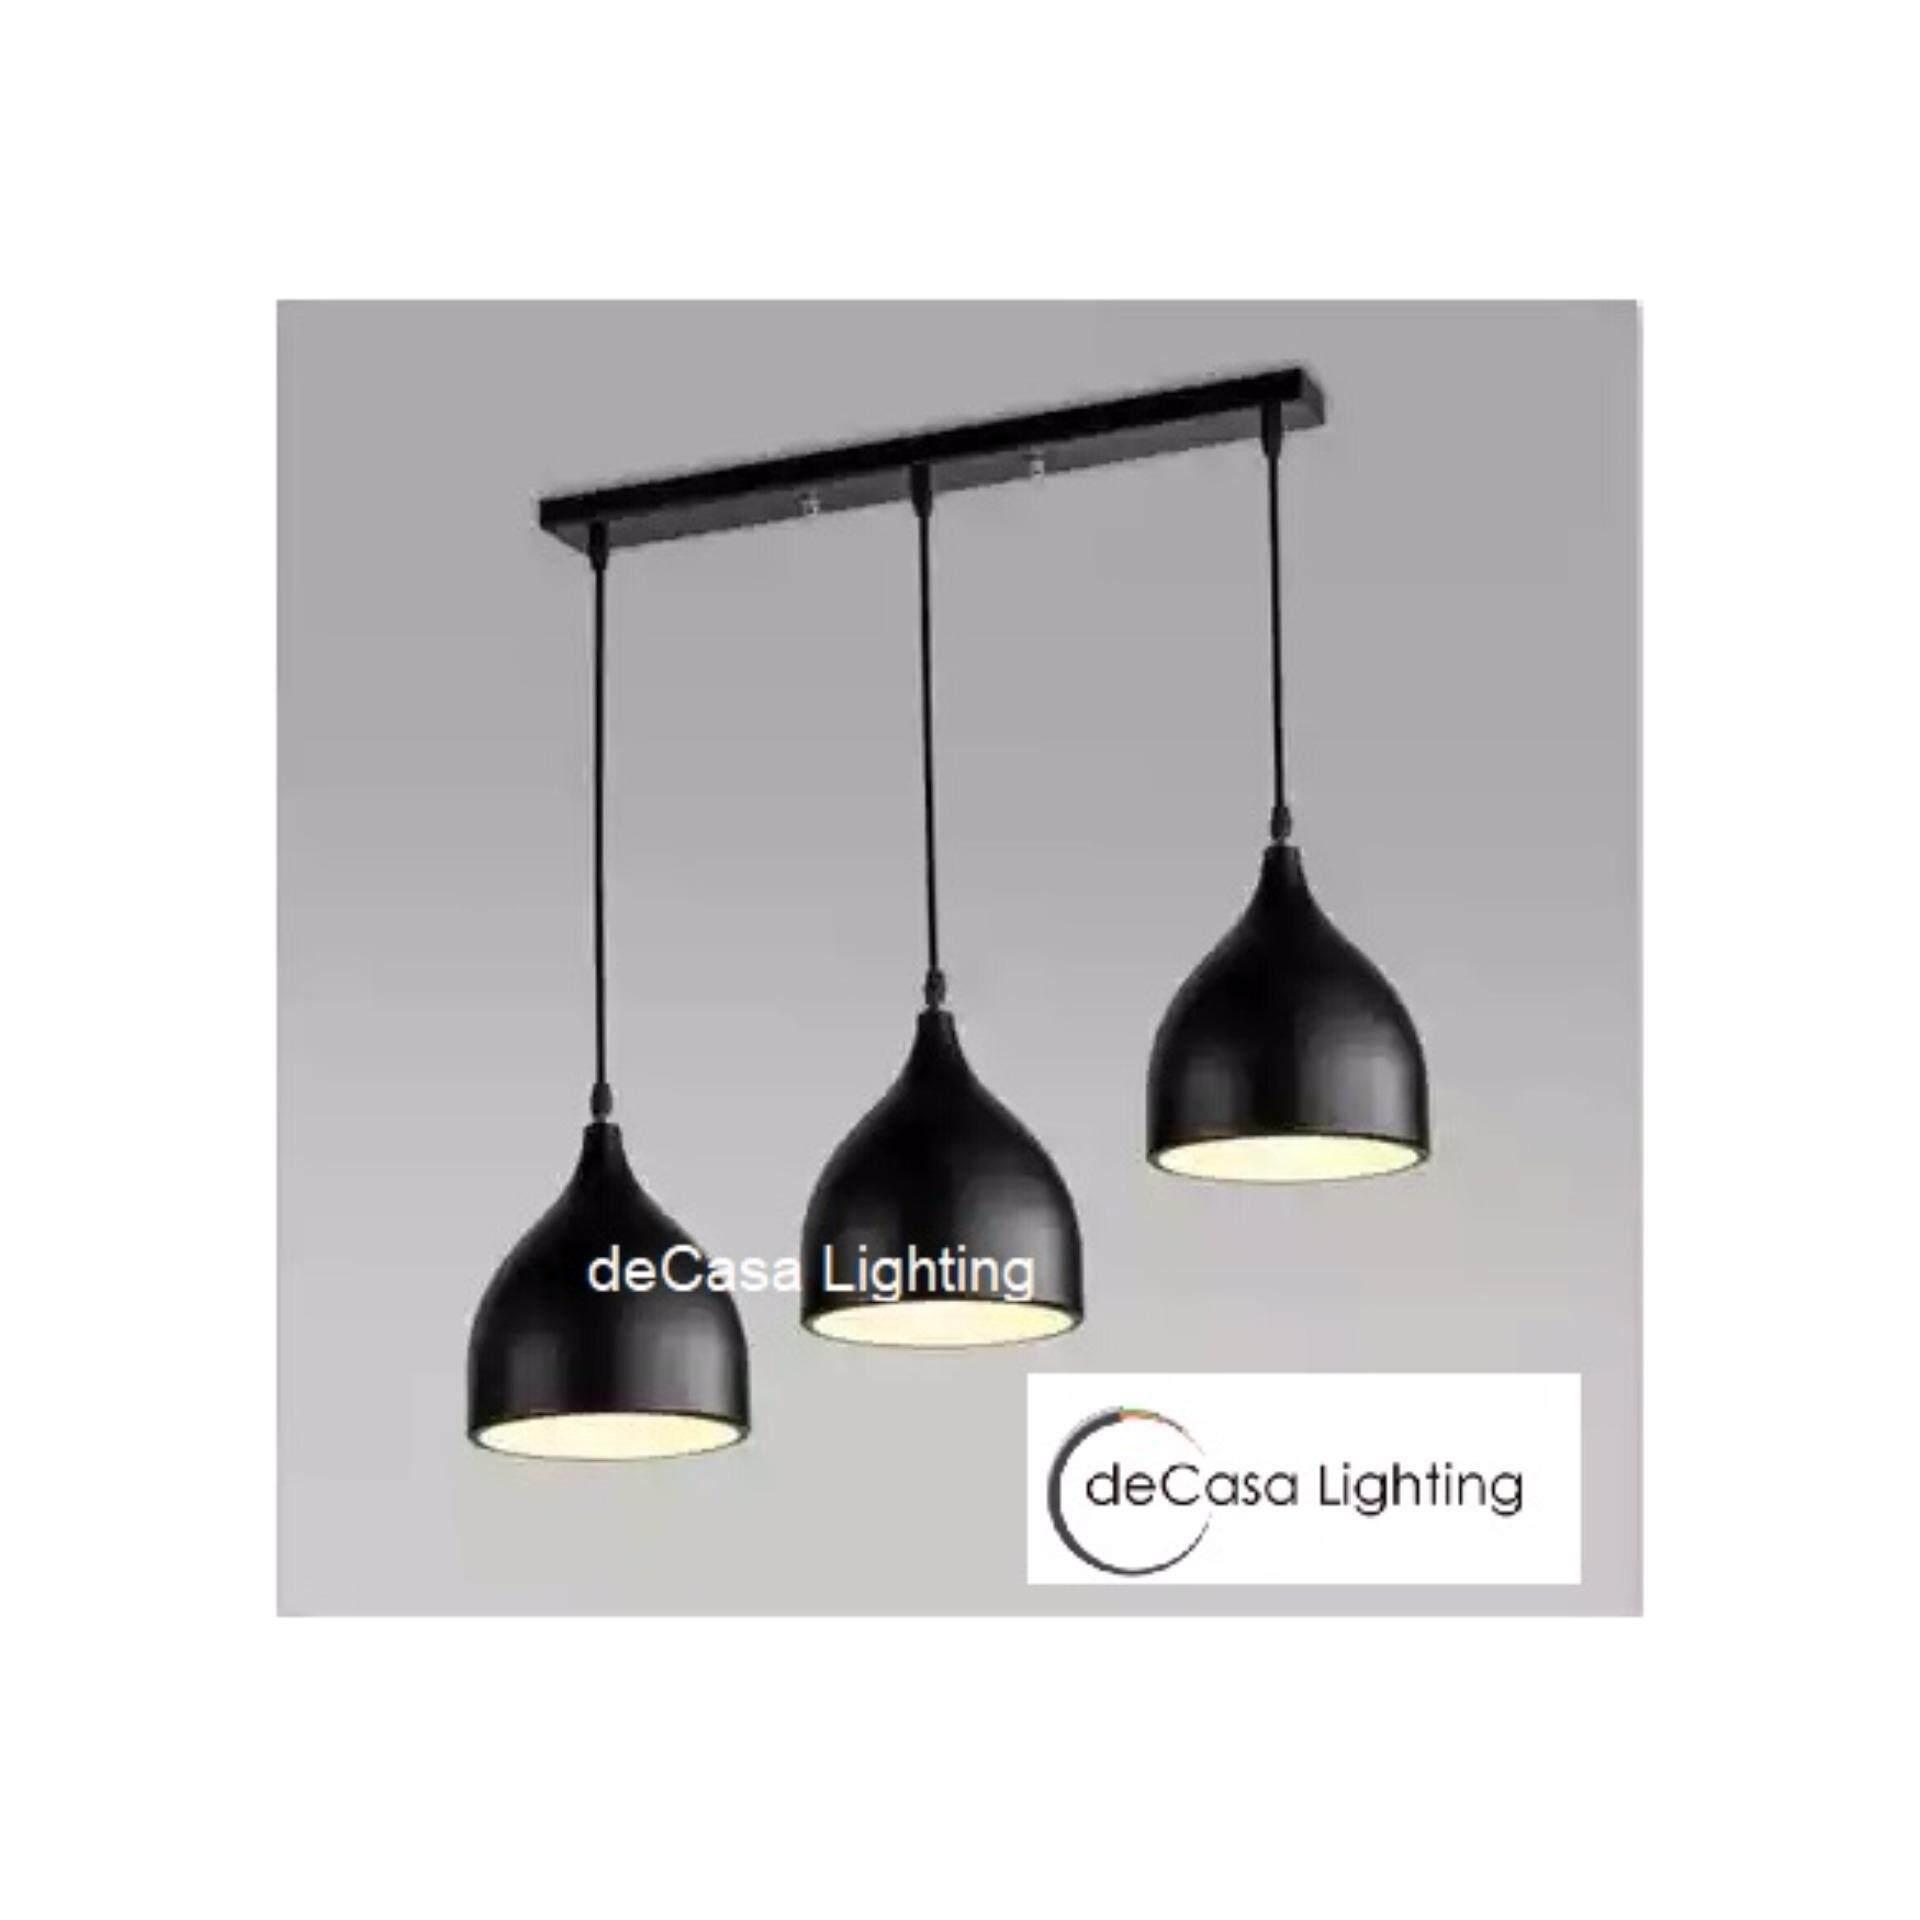 DECASA Set 3 Black Decorative Ceiling Light Best Buy Designer Decorative Pendant Light LY